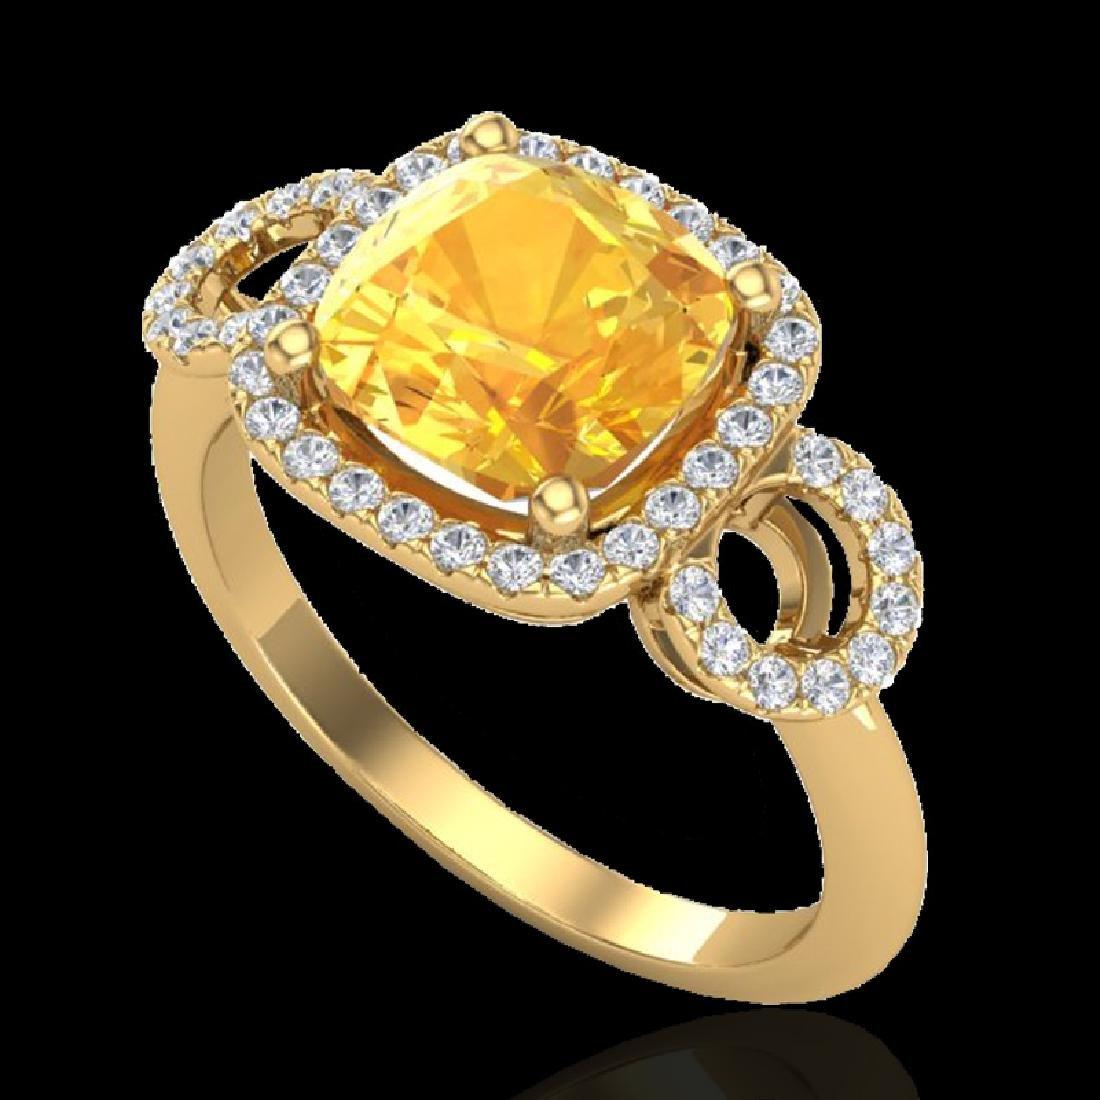 3.75 CTW Citrine & Micro VS/SI Diamond Ring 18K Yellow - 2